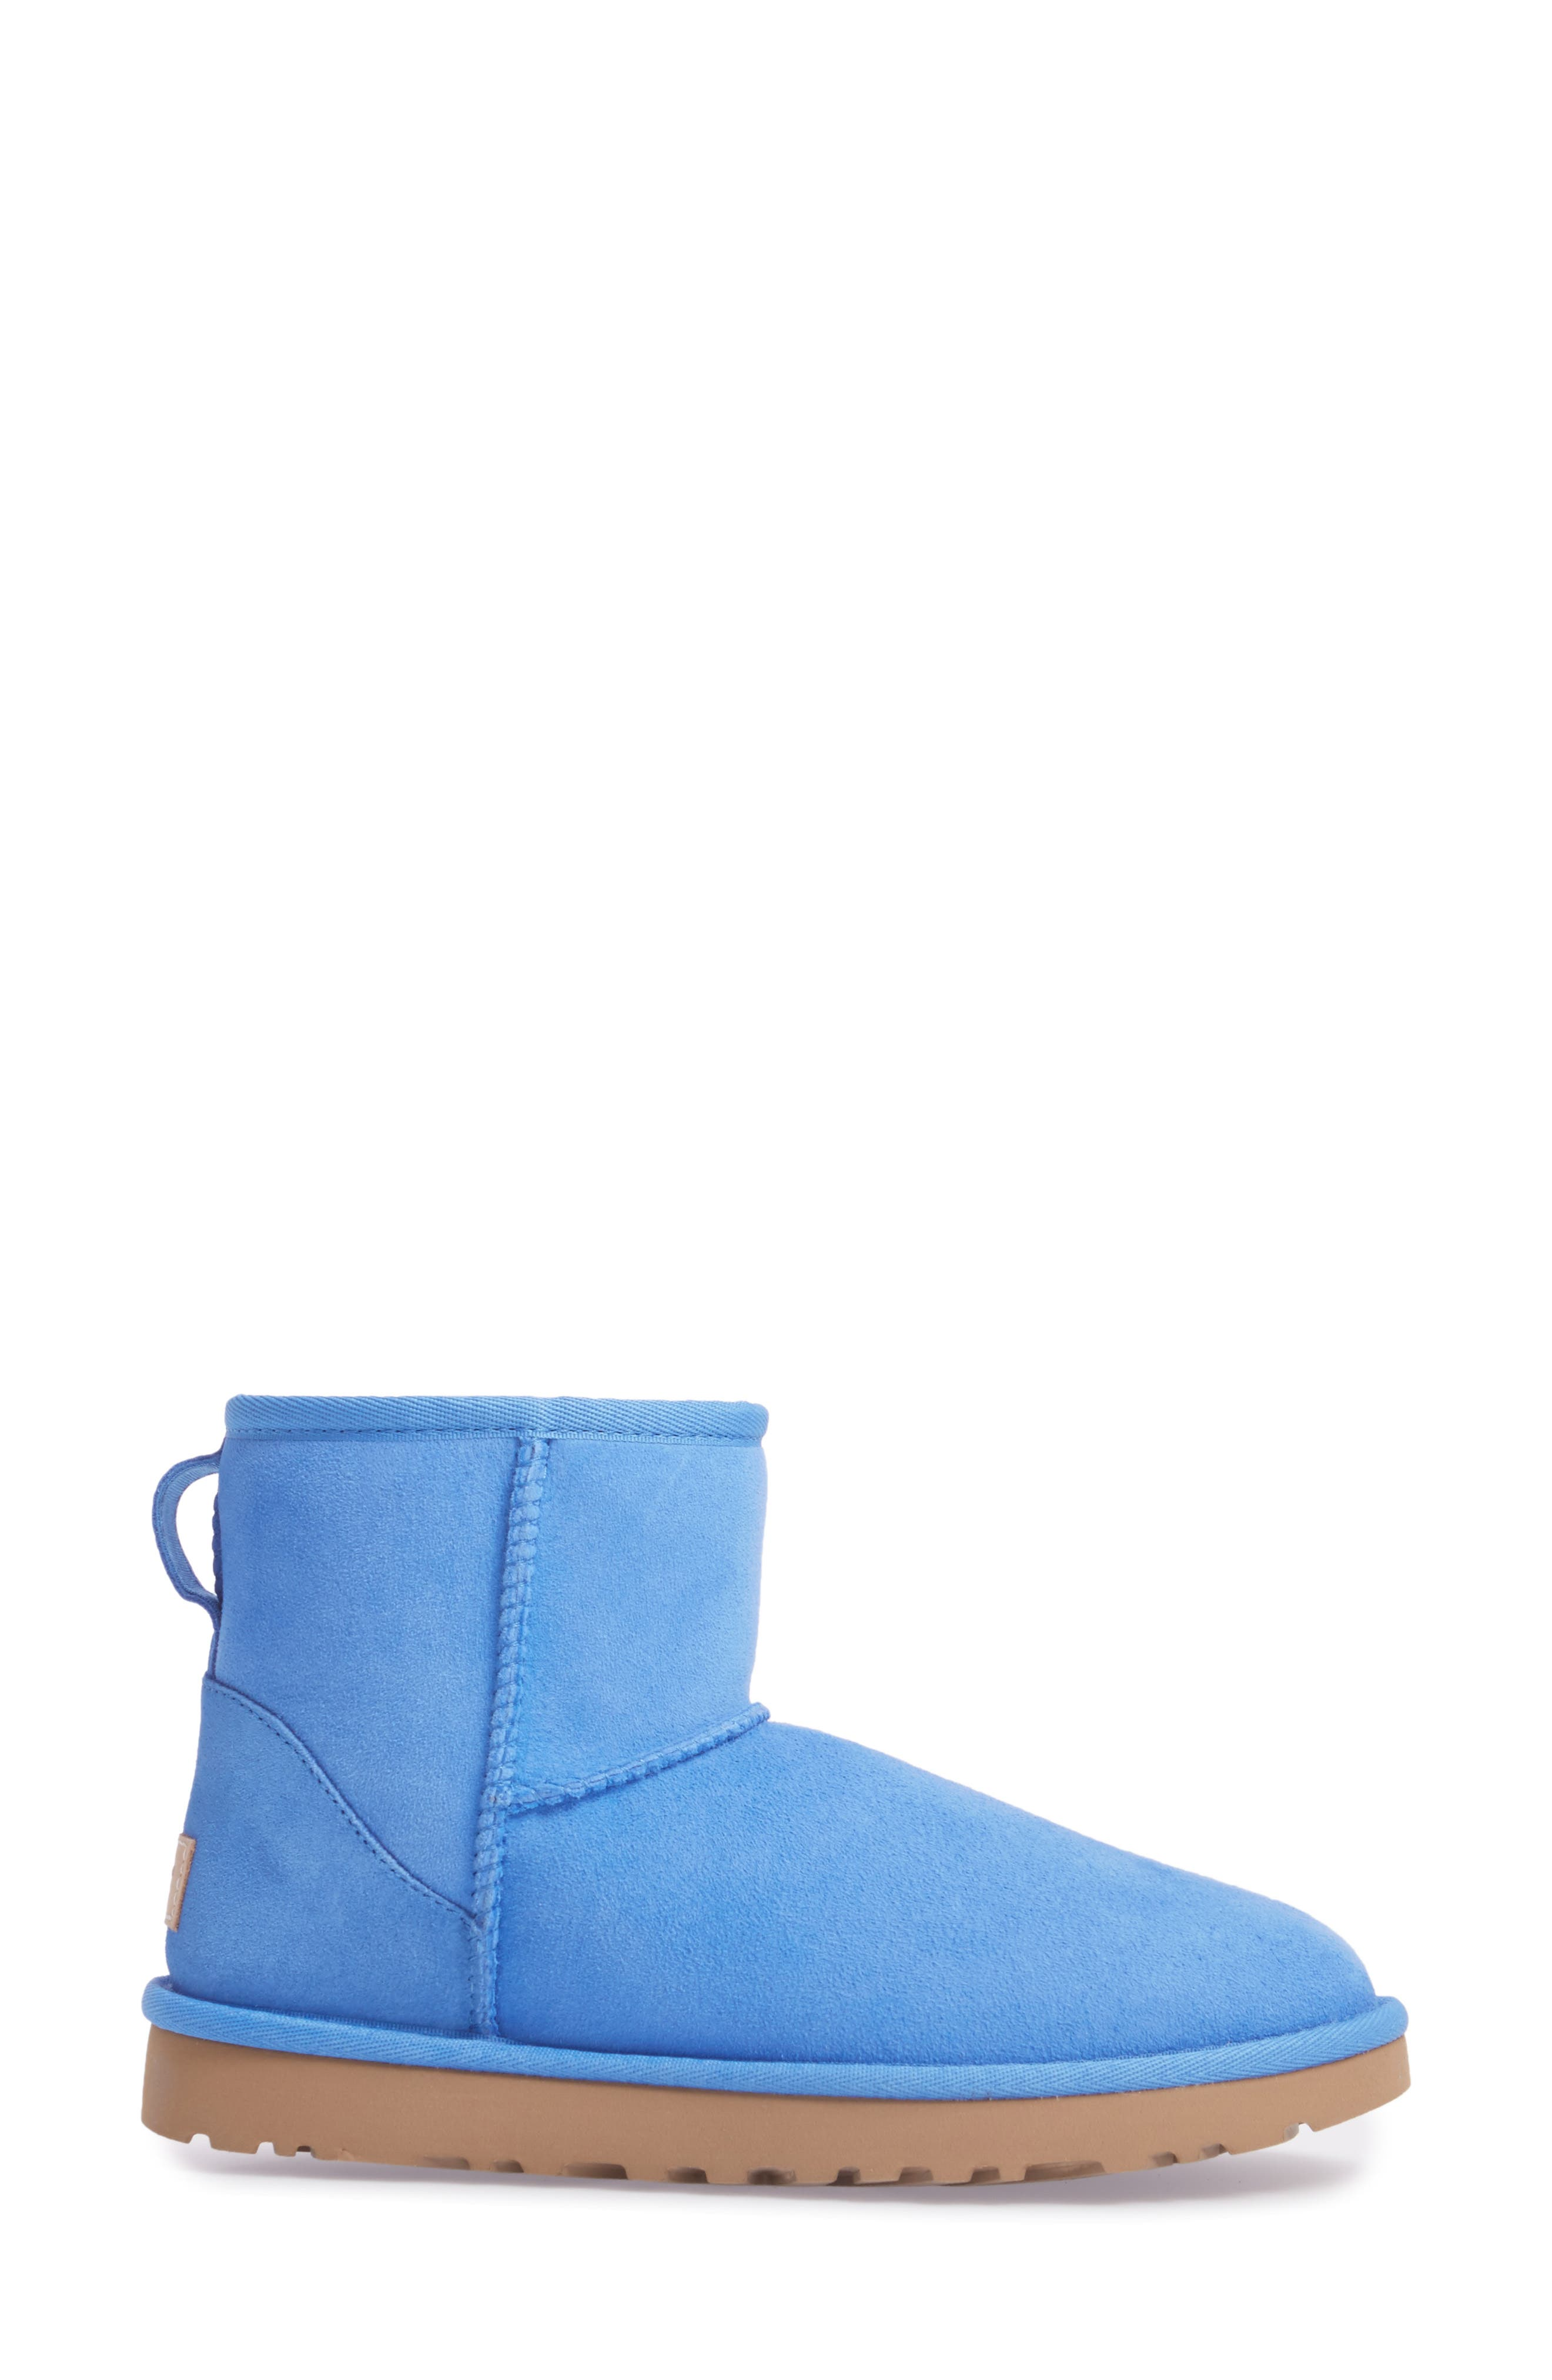 Alternate Image 3  - UGG® 'Classic Mini II' Genuine Shearling Lined Boot (Women)